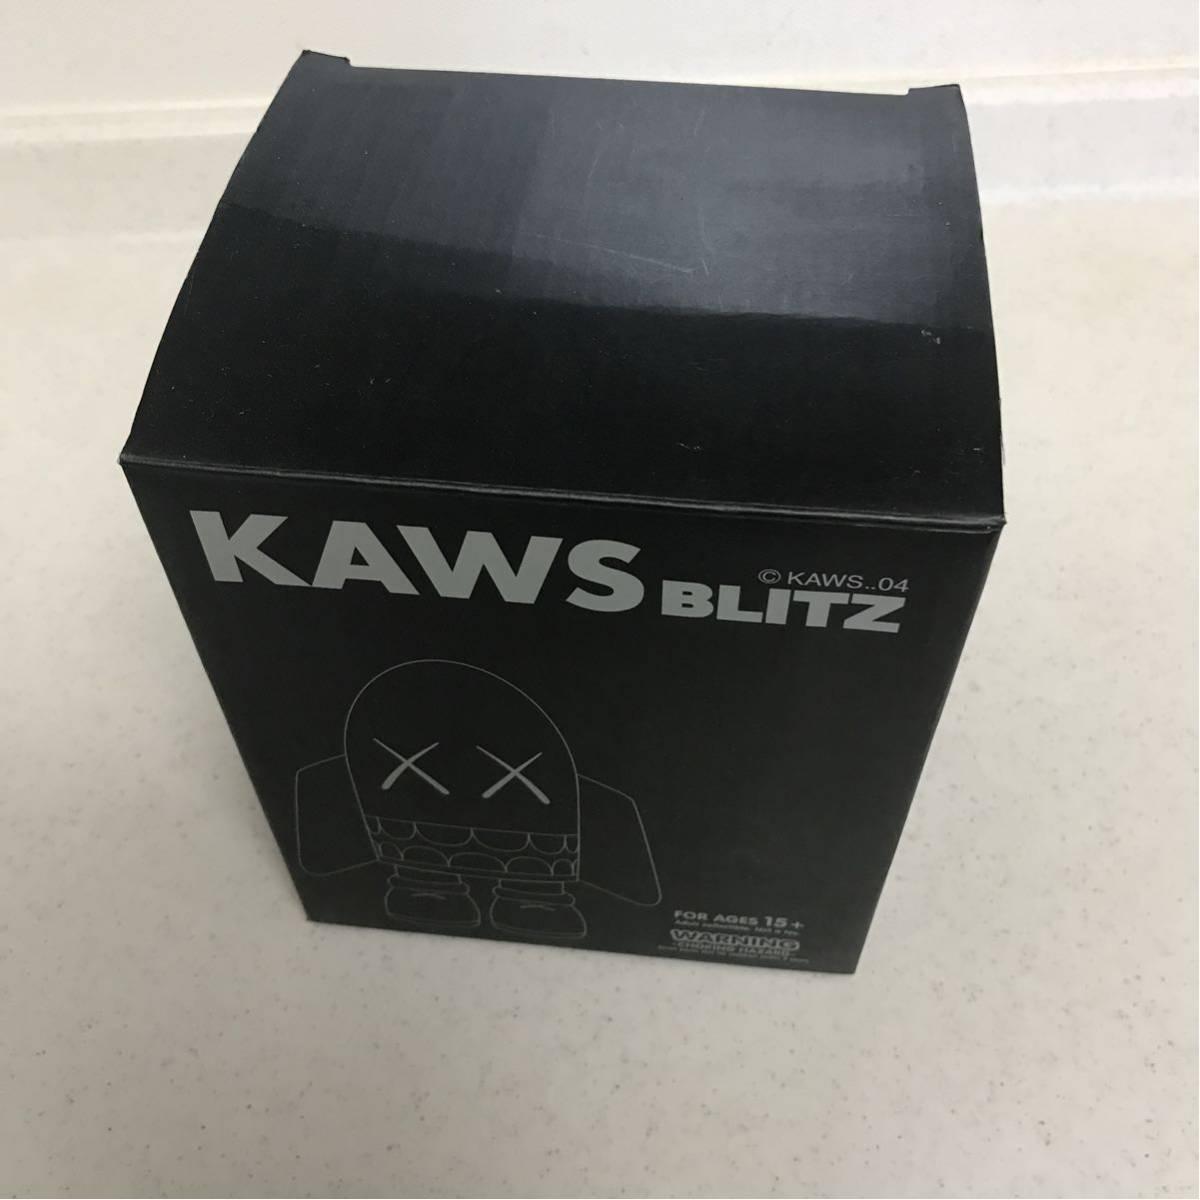 KAWS BLITZ Hectic Bounty Hunter Companion BXH OriginalFake カウズ バウンティハンター オリジナルフェイク コンパニオン ソフビ_画像6